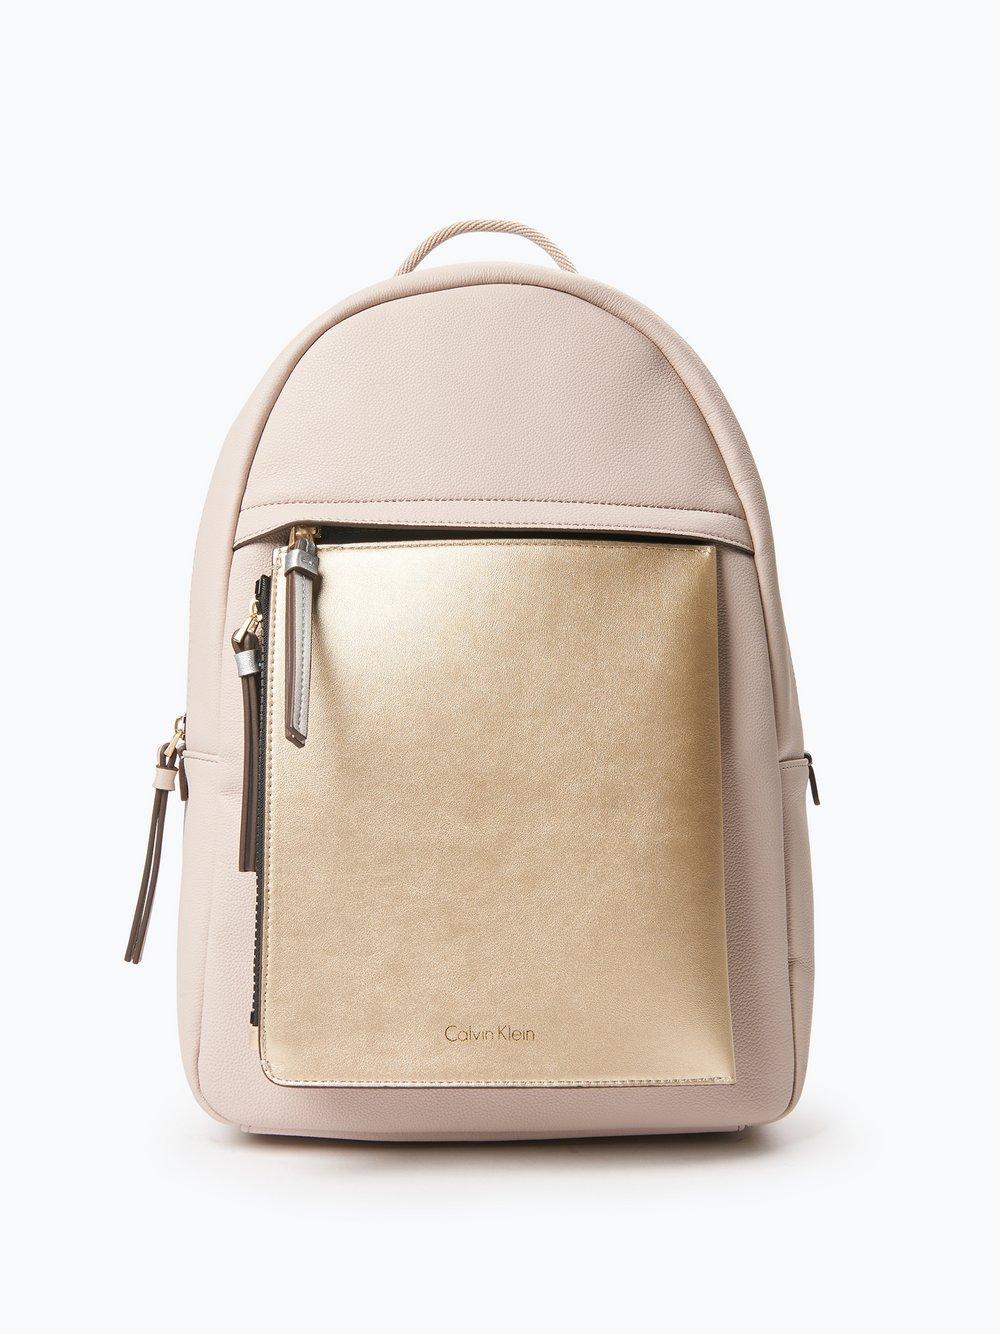 639ea223a88ef Calvin Klein Damen Rucksack in Leder-Optik online kaufen